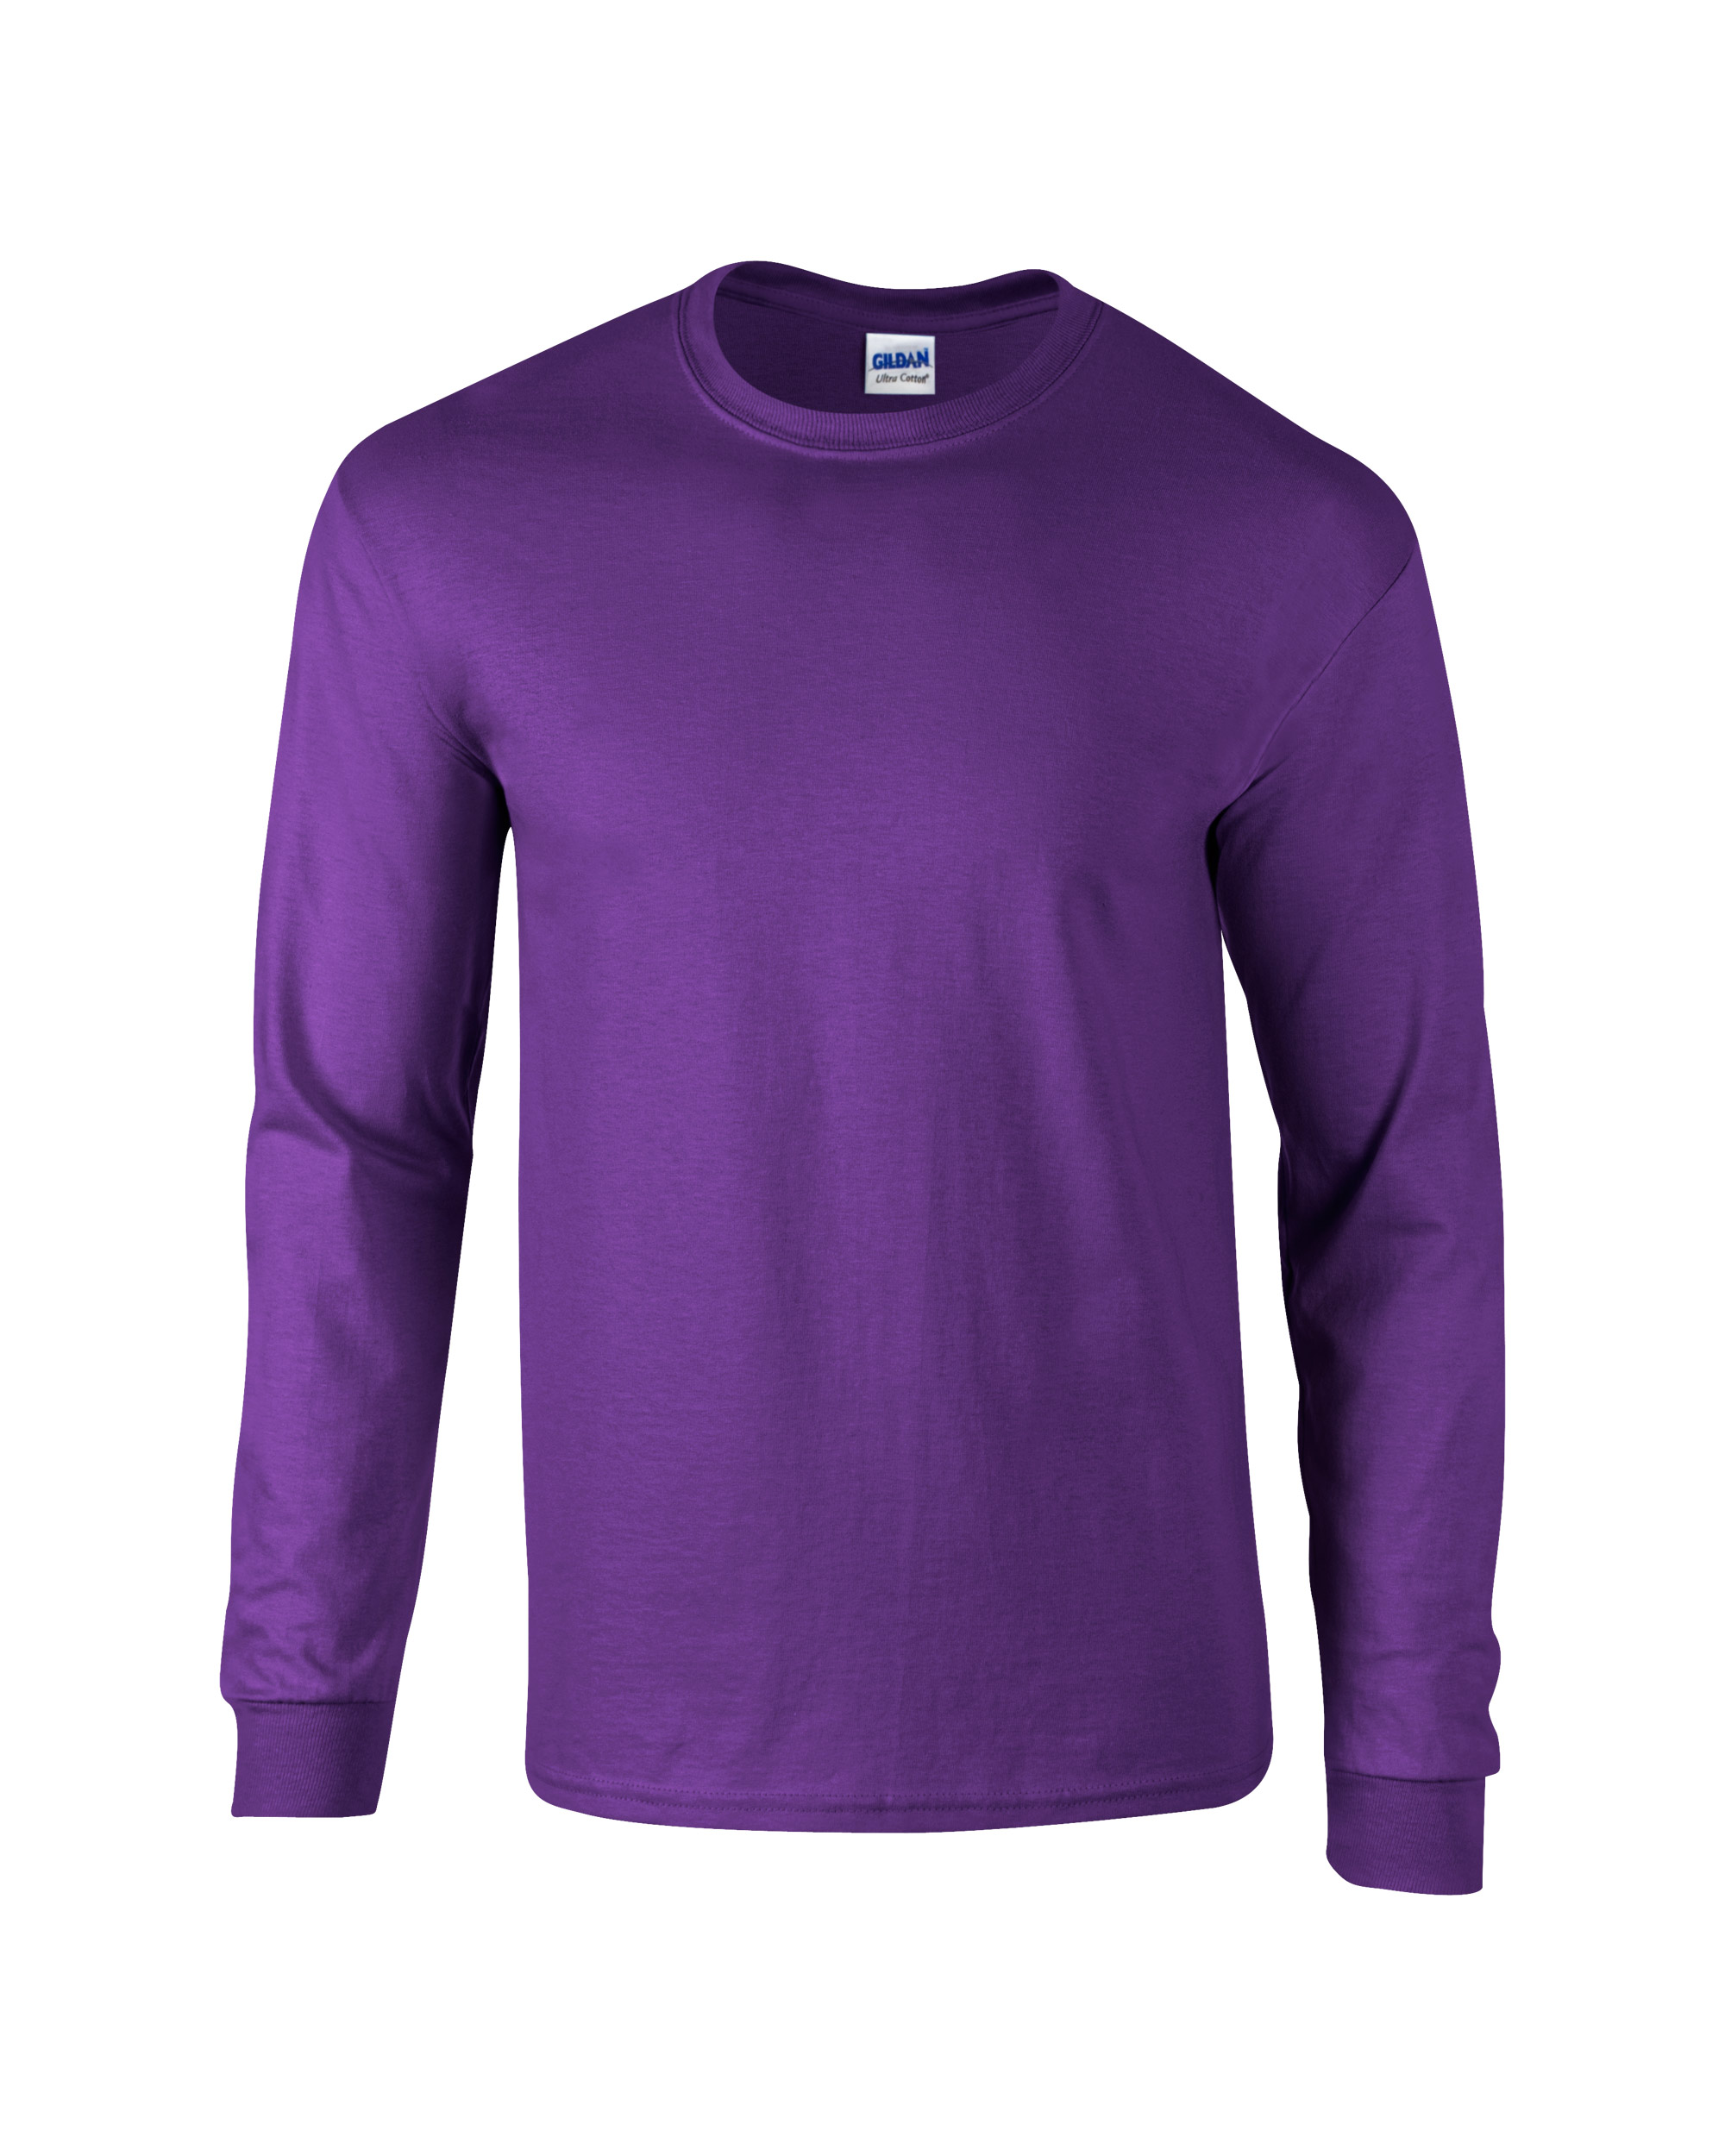 Uni Ultra Cotton Long Sleeve T Shirt Purple Front